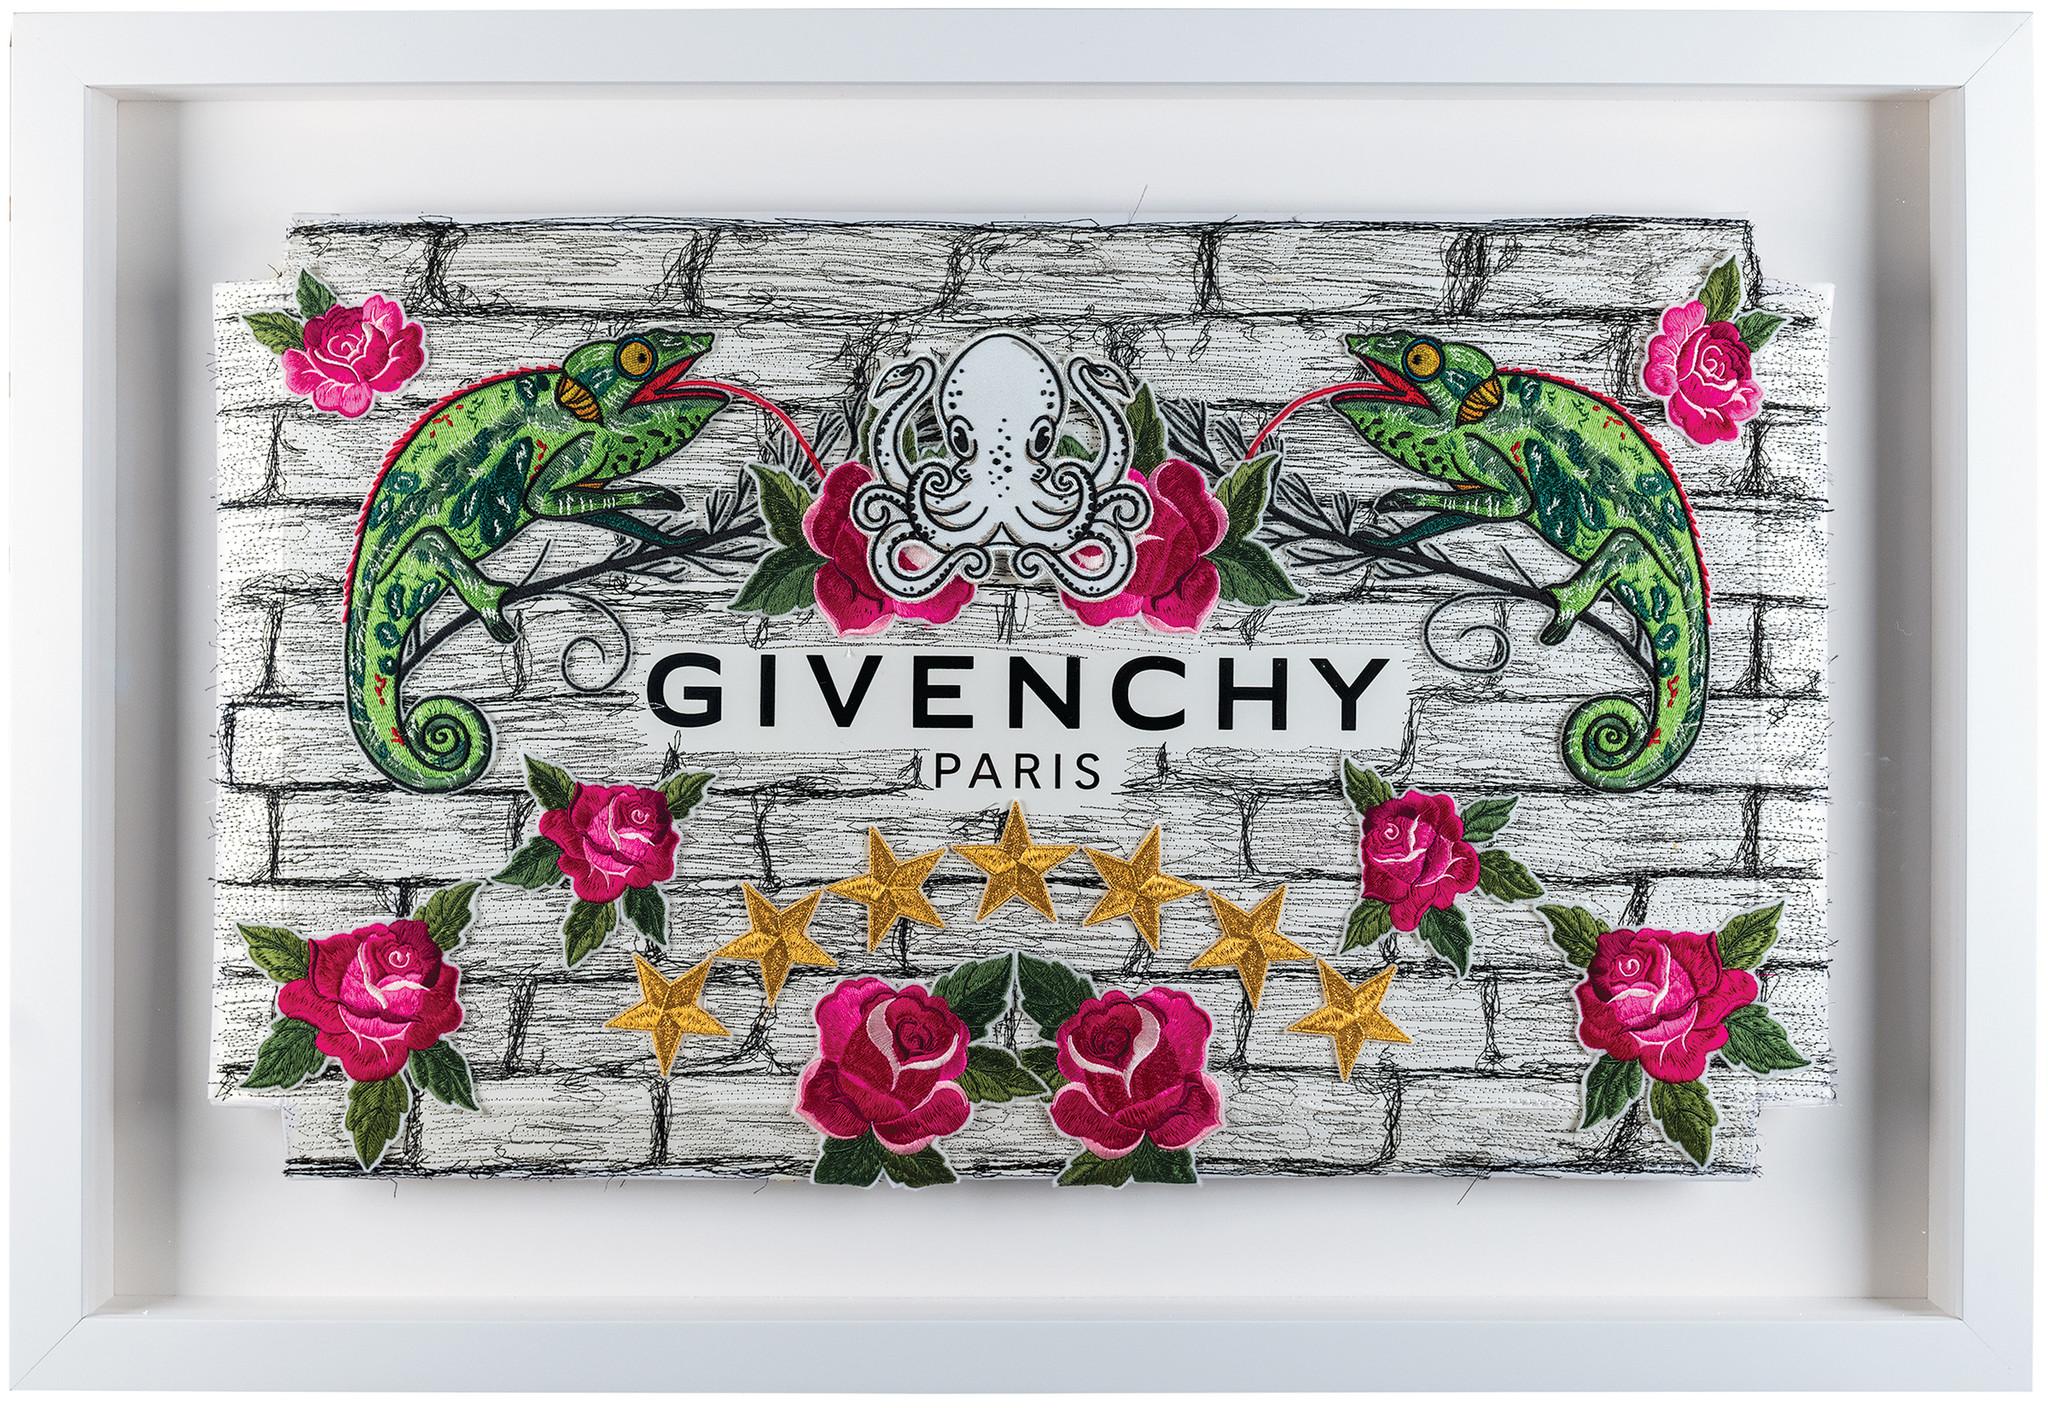 Givenchy Urban Chameleon